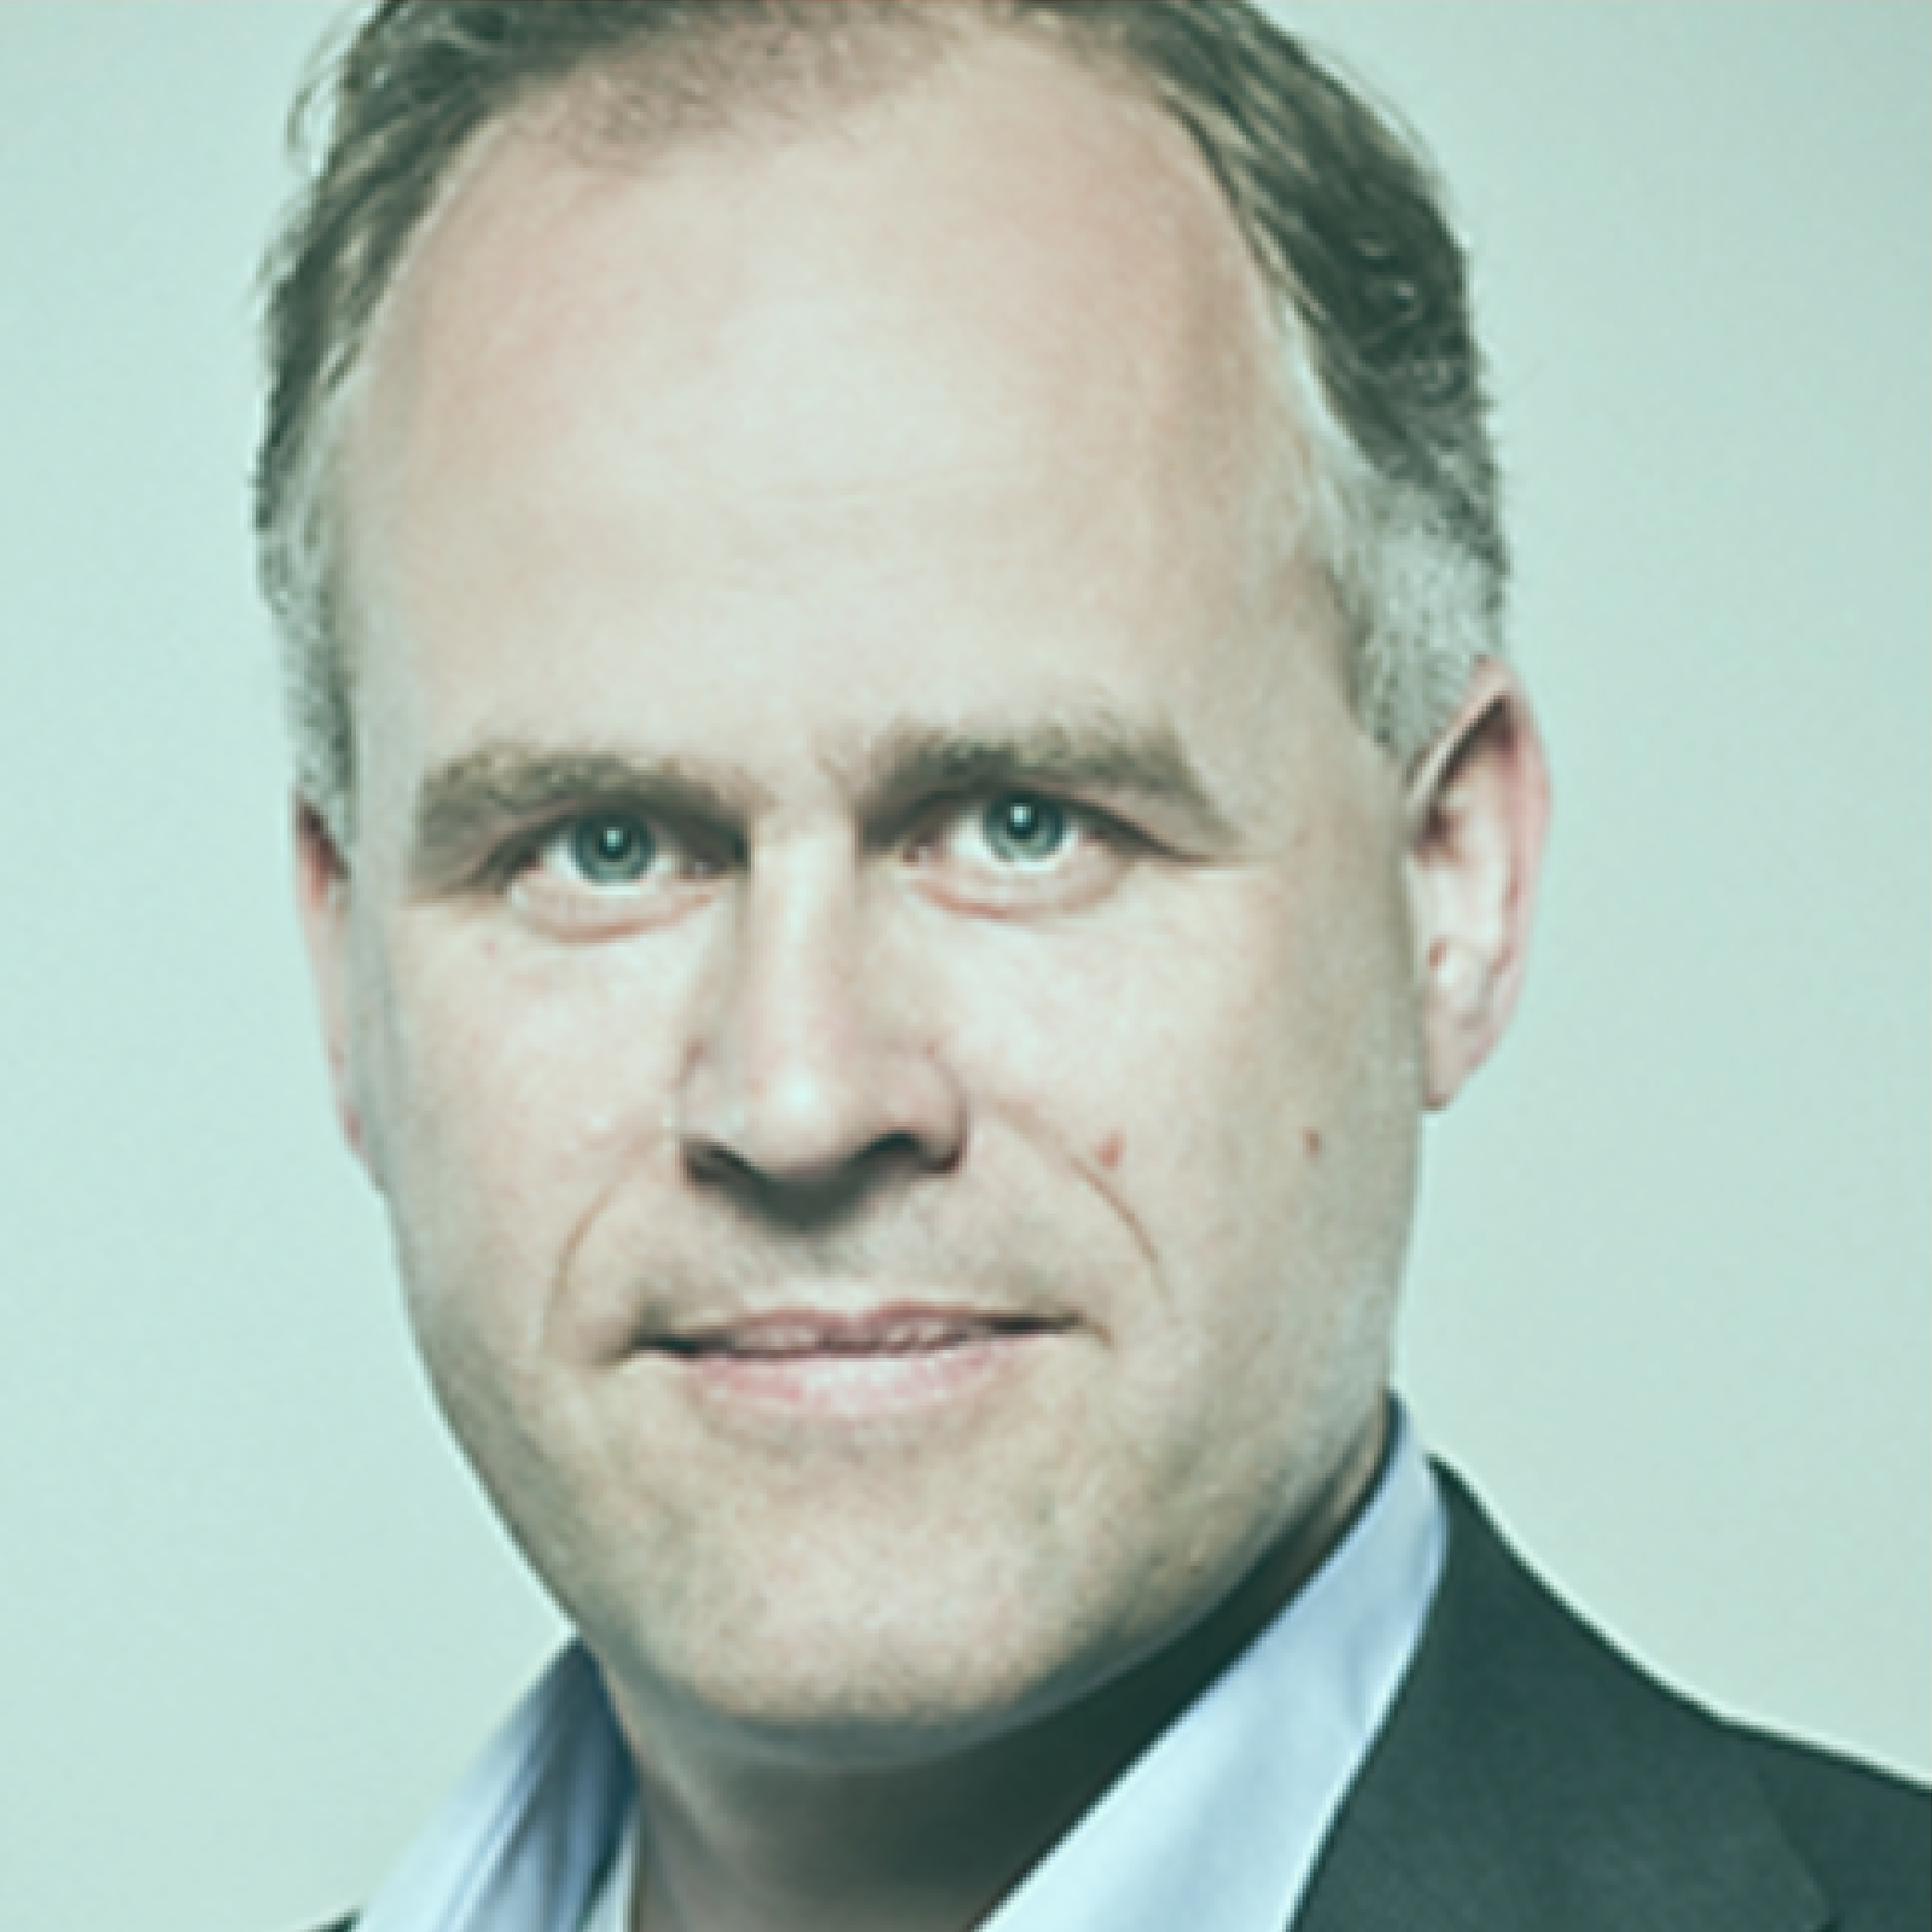 Nils Schmeling - Leadership & Customer Experience18 July 2018